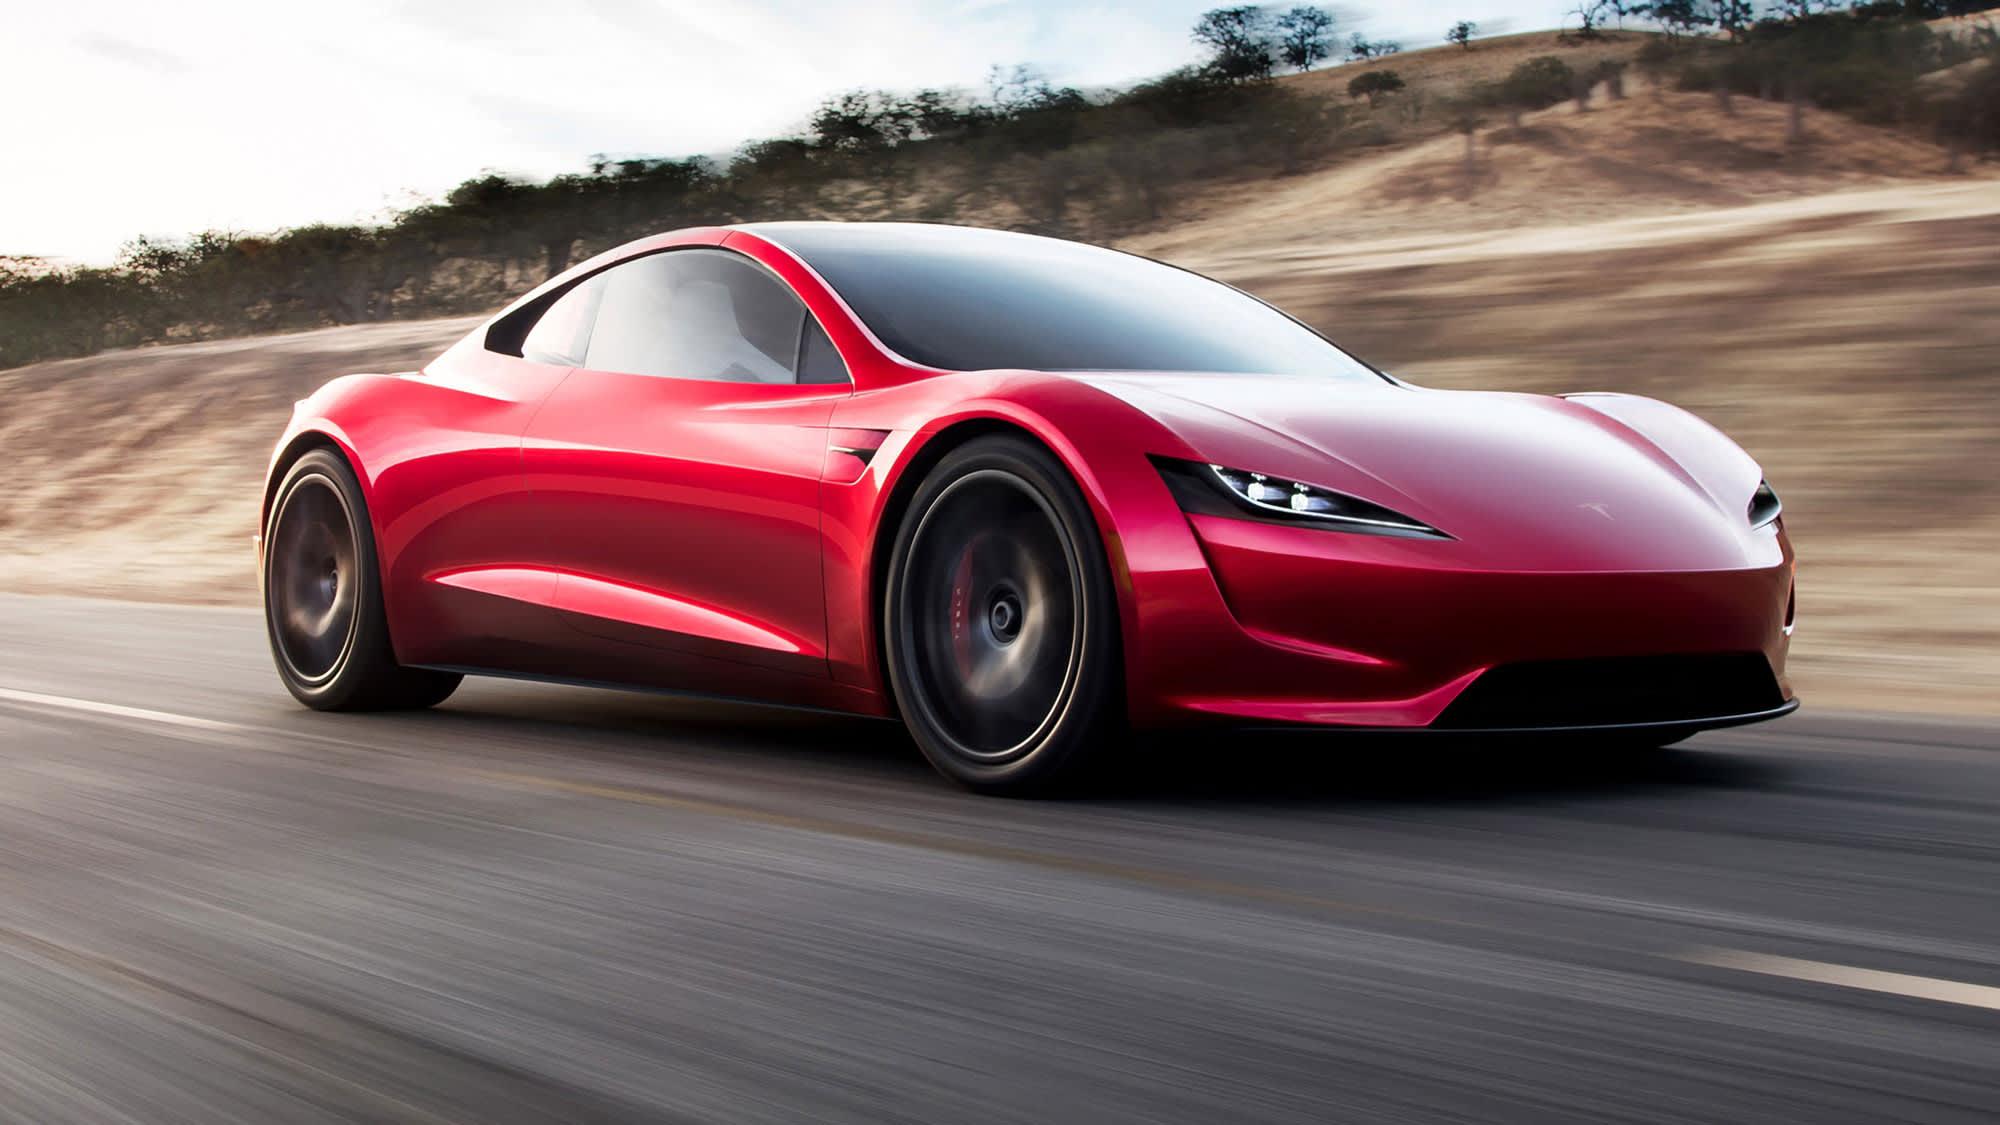 Battery start-ups are raising millions in the battle to crush Tesla